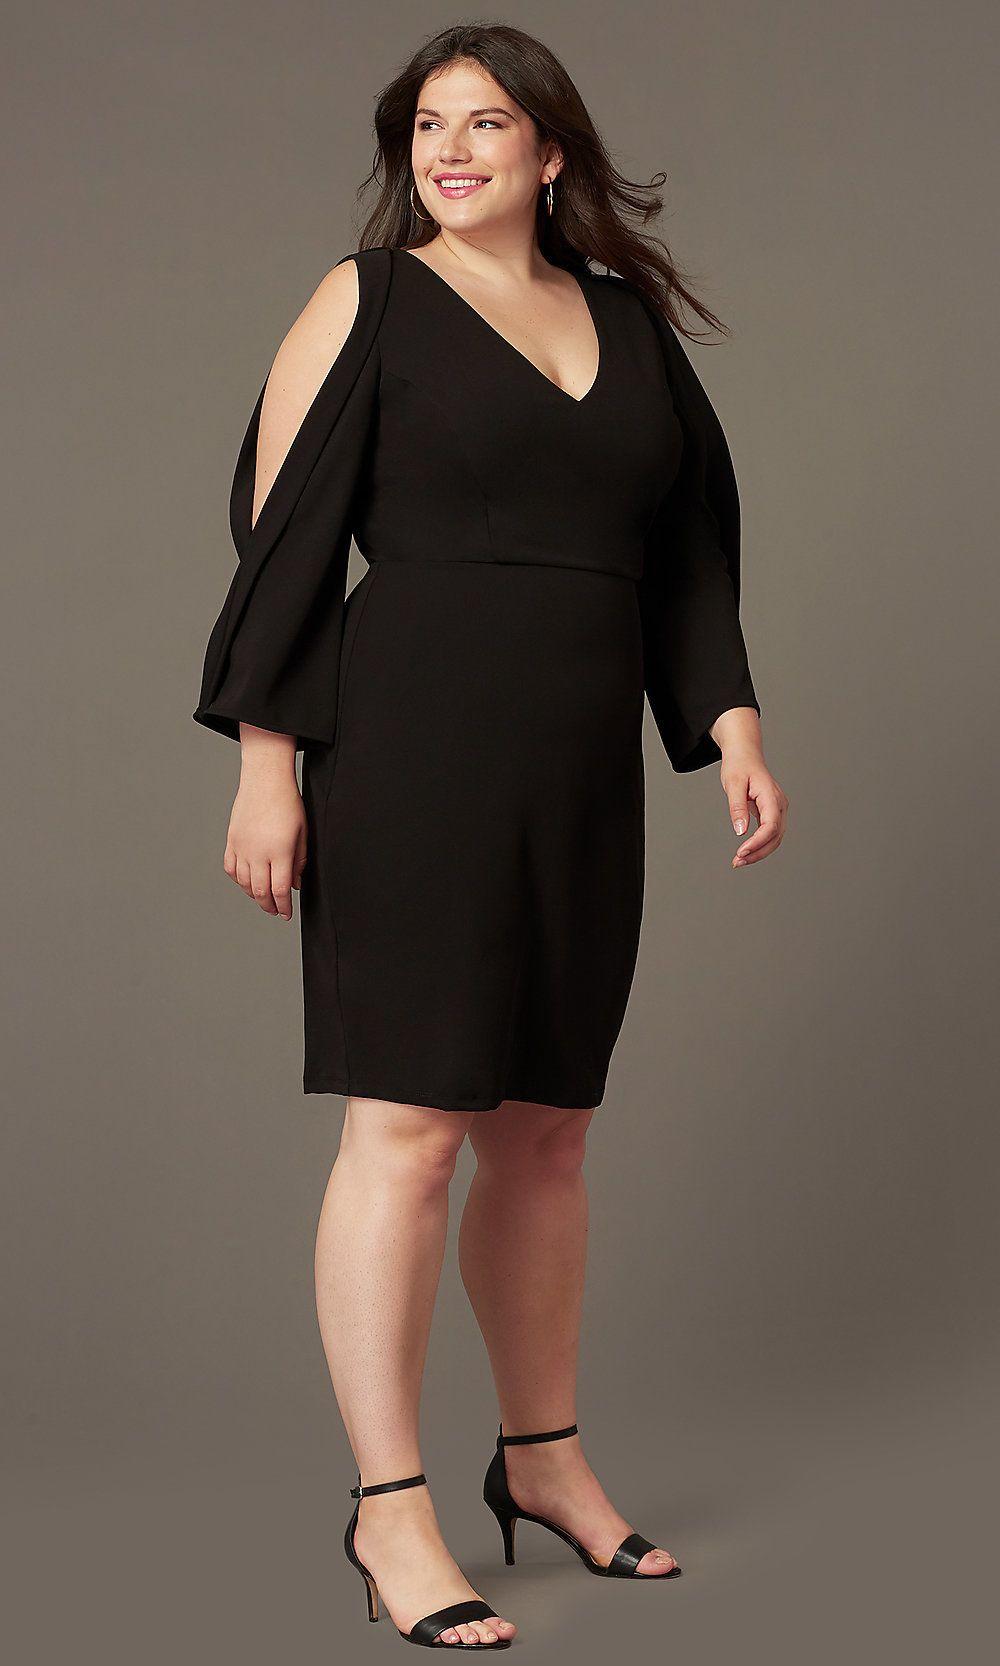 Plus Size Short Black Formal Dress With Sleeves Dresses With Sleeves Knee Length Cocktail Dress Black Dress Formal [ 1666 x 1000 Pixel ]